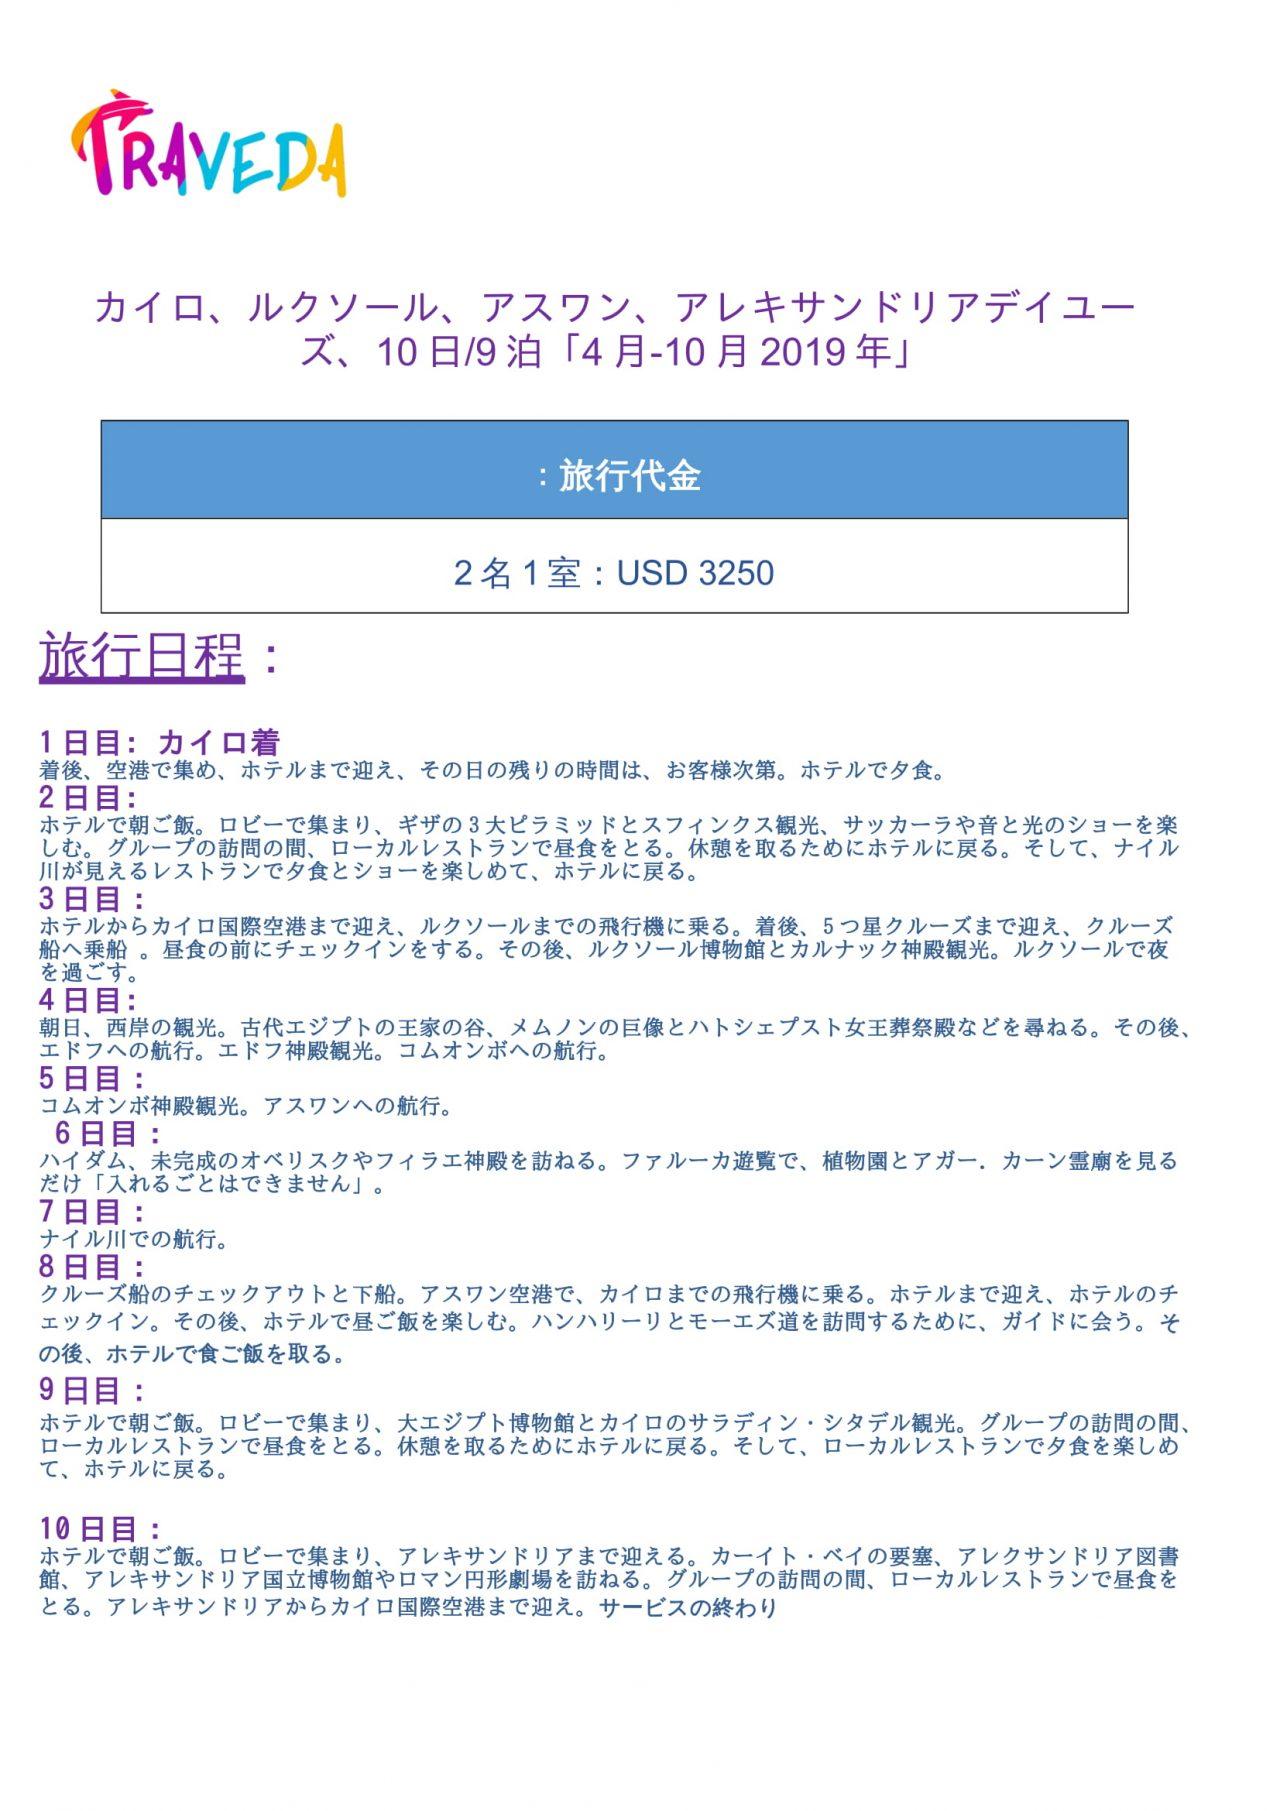 https://traveda.net/wp-content/uploads/2019/03/CAIROLUXOR-ASWAN-CRUISEDAY-USE@-ALEXANDRIA-10DAYS-09NIGHTS-Japanese-1-1280x1811.jpg